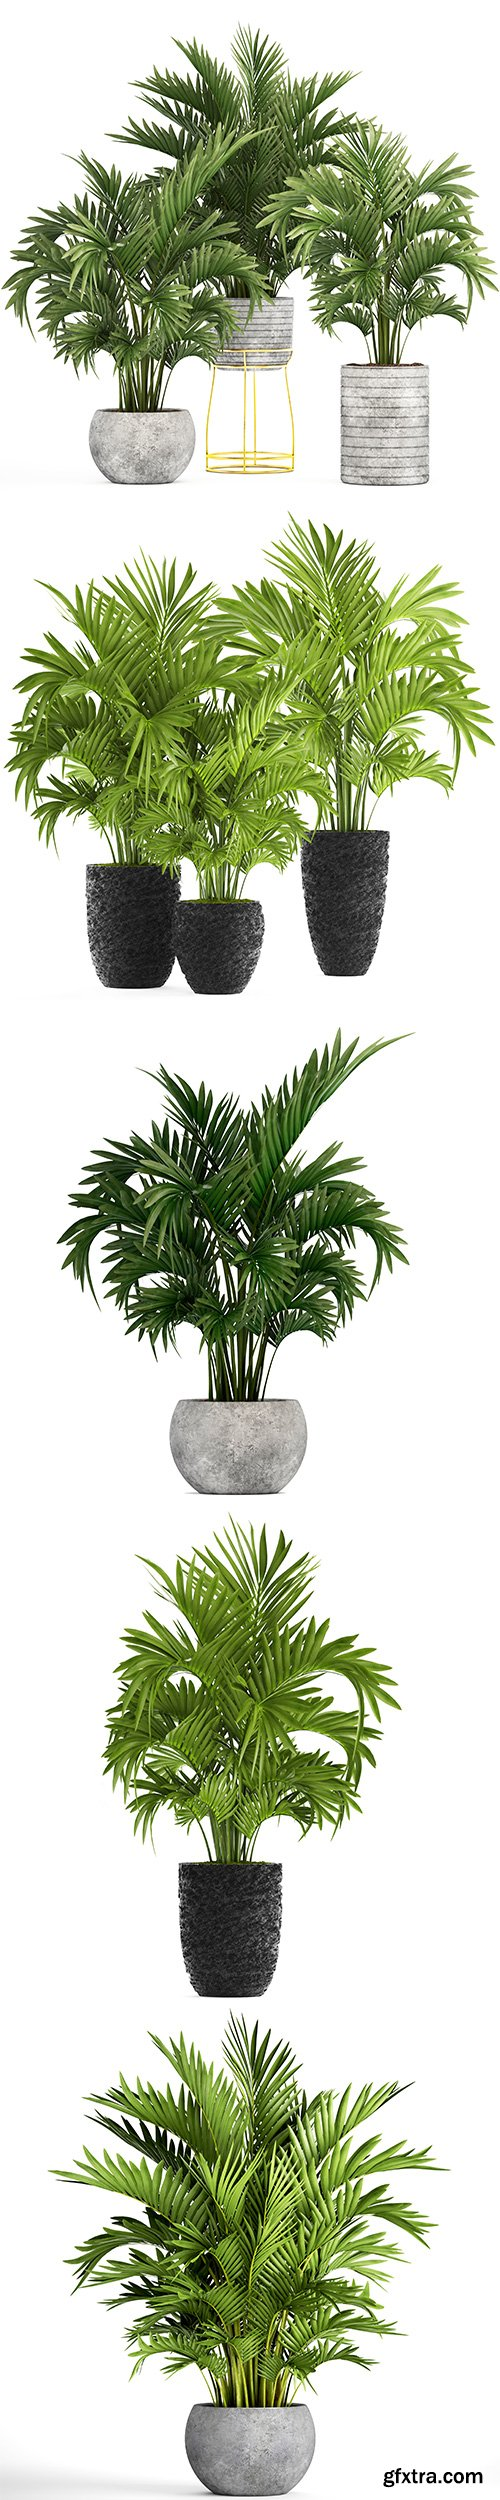 Howea Palm Isolated - 6xJPGs